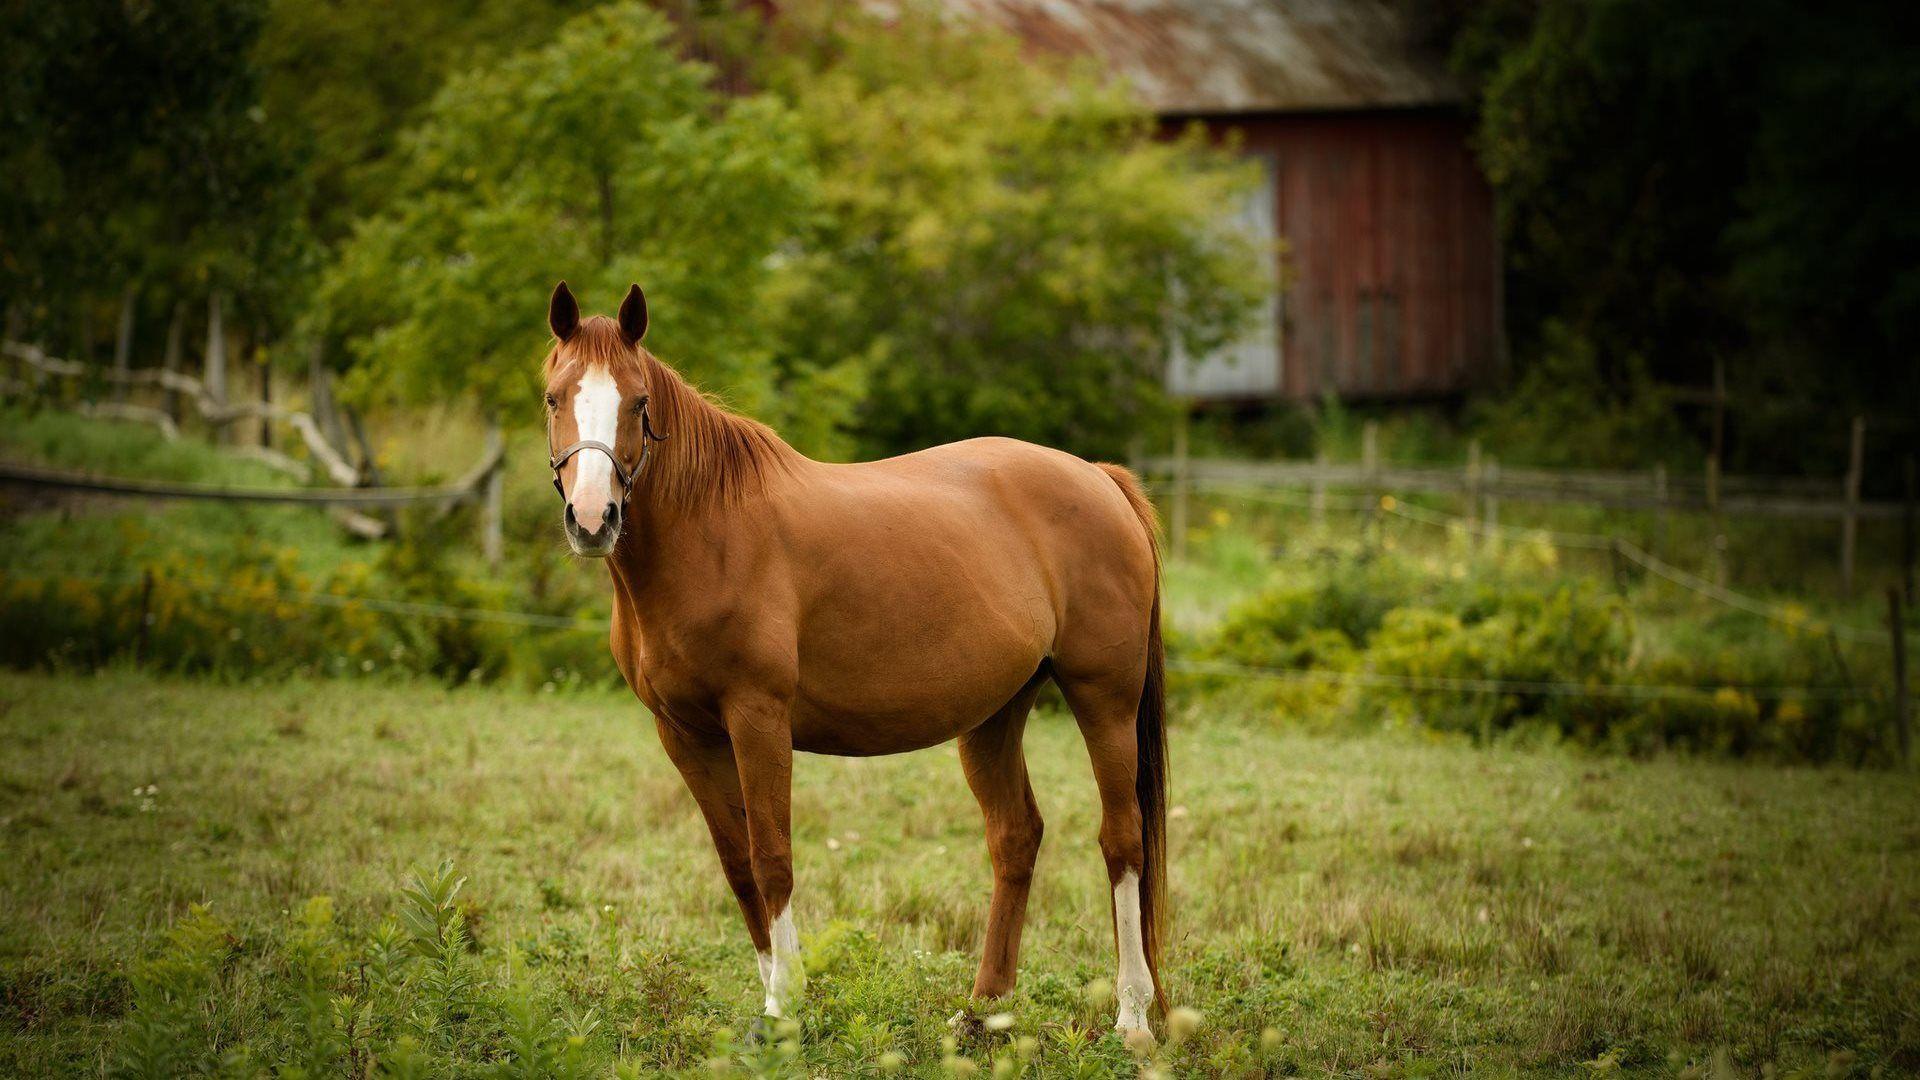 love horses pasture wallpaper - photo #5